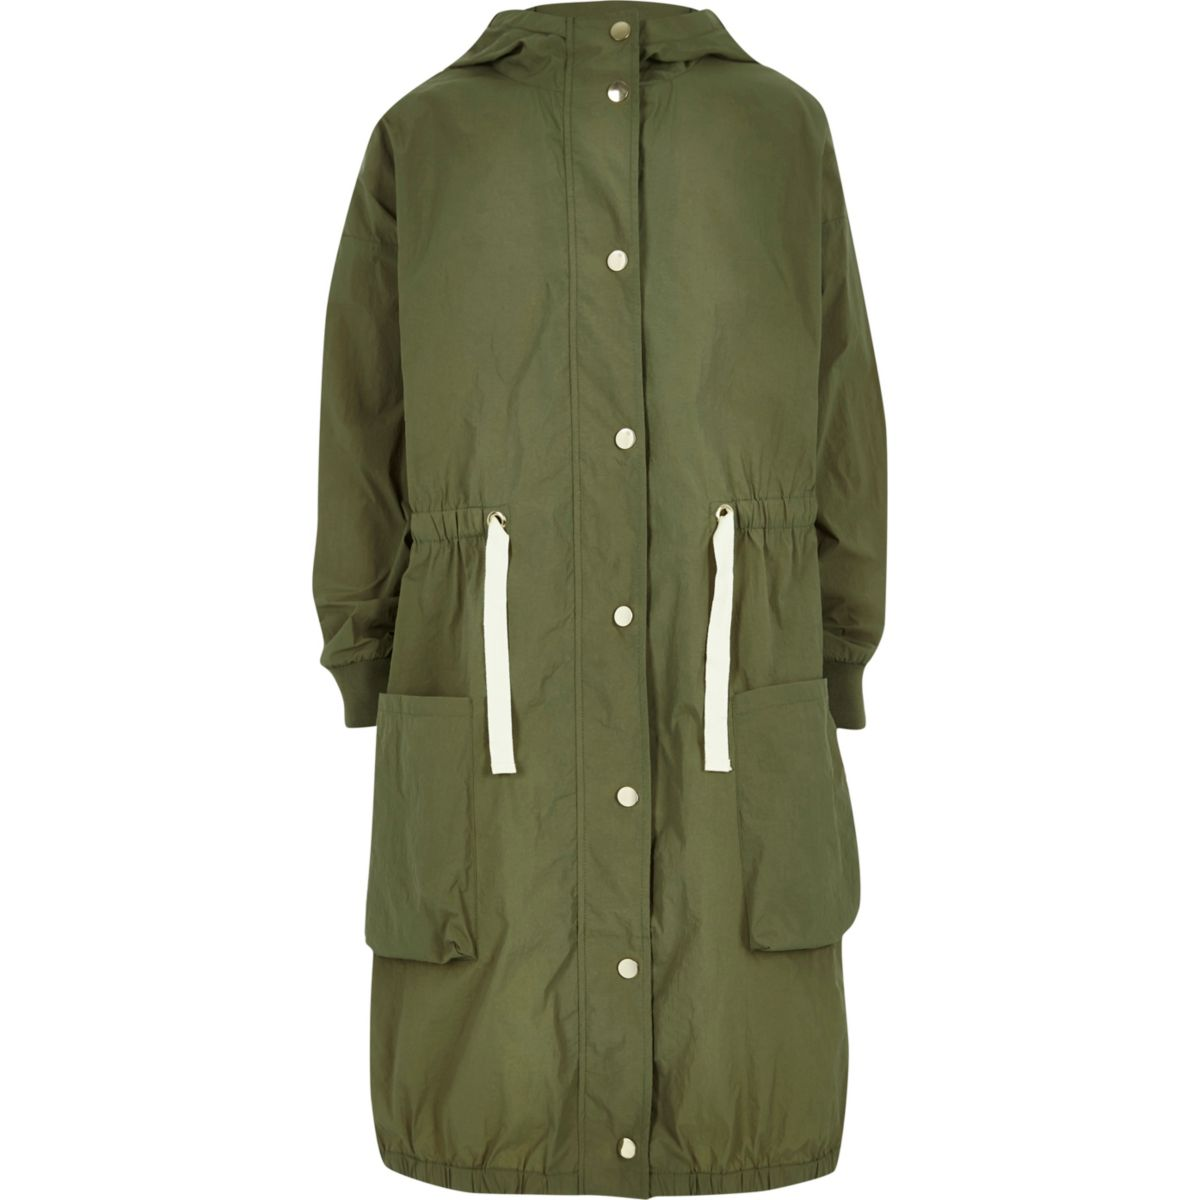 Girls khaki lightweight parka jacket